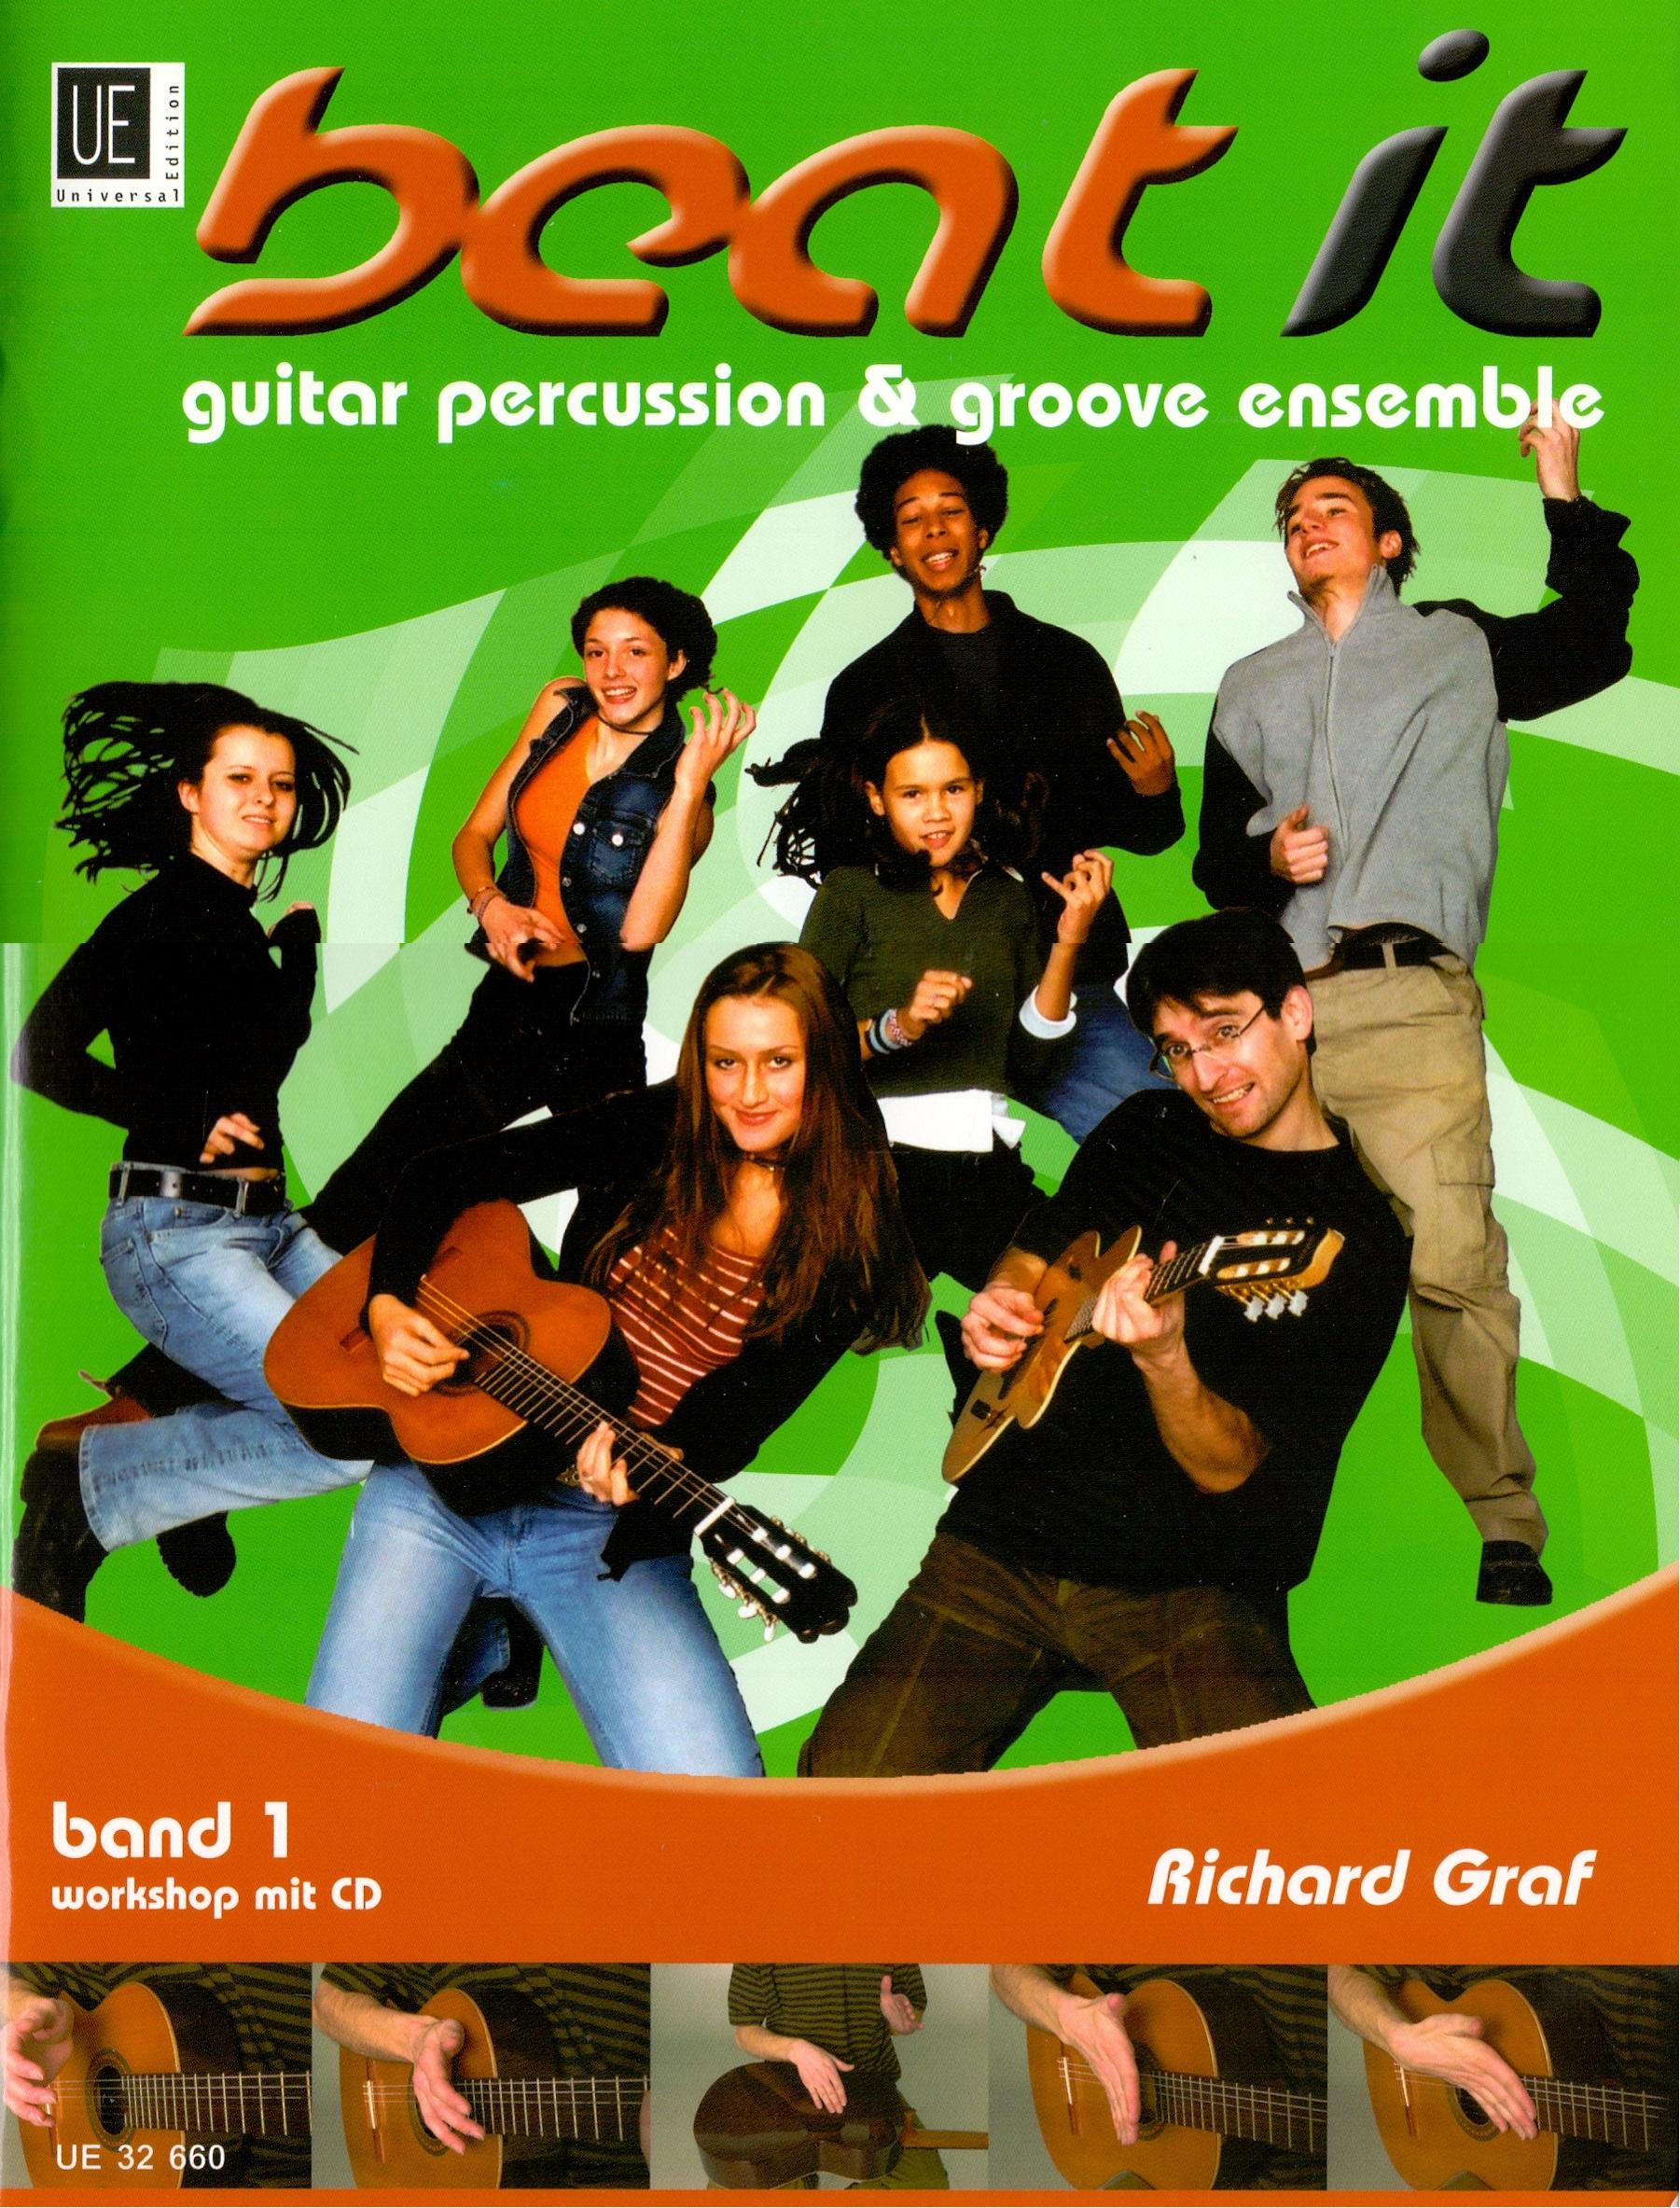 Beat It: Band 1 - Guitar Percussion & Groove Ensemble - Richard Graf [Broschiert, inkl. CD]